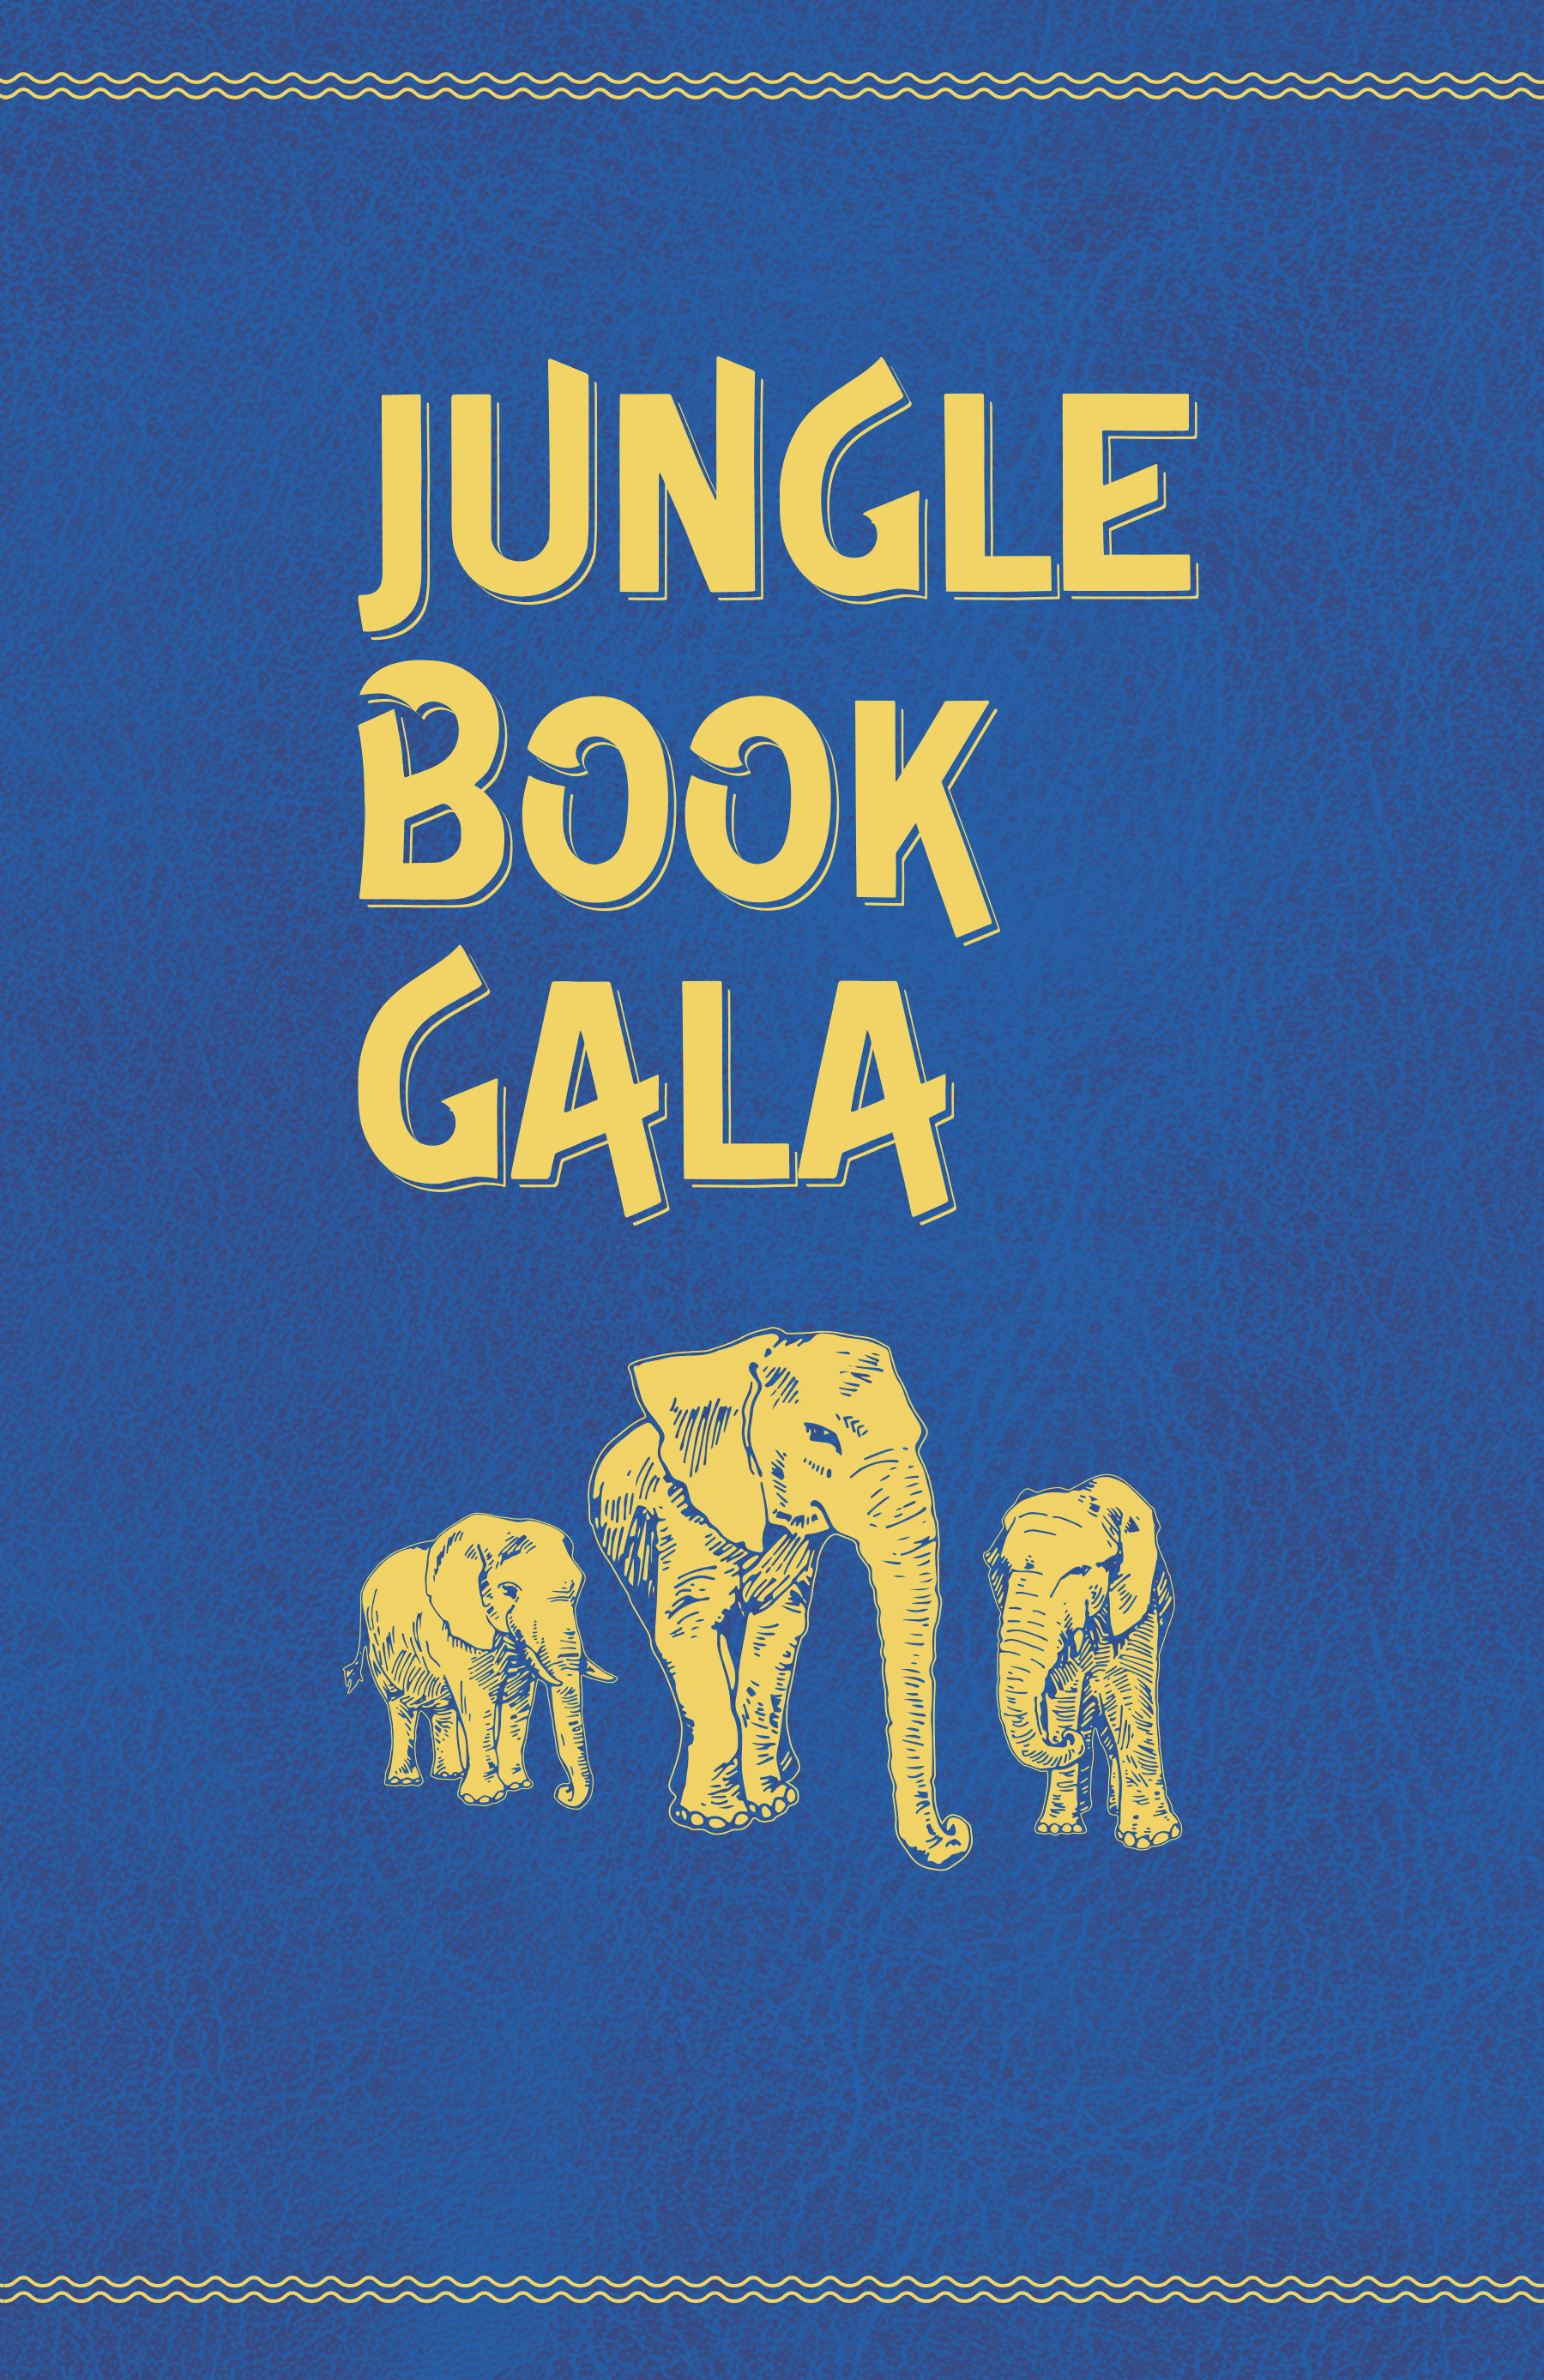 Jungle Book Gala - digital invitation_Page_1.jpg